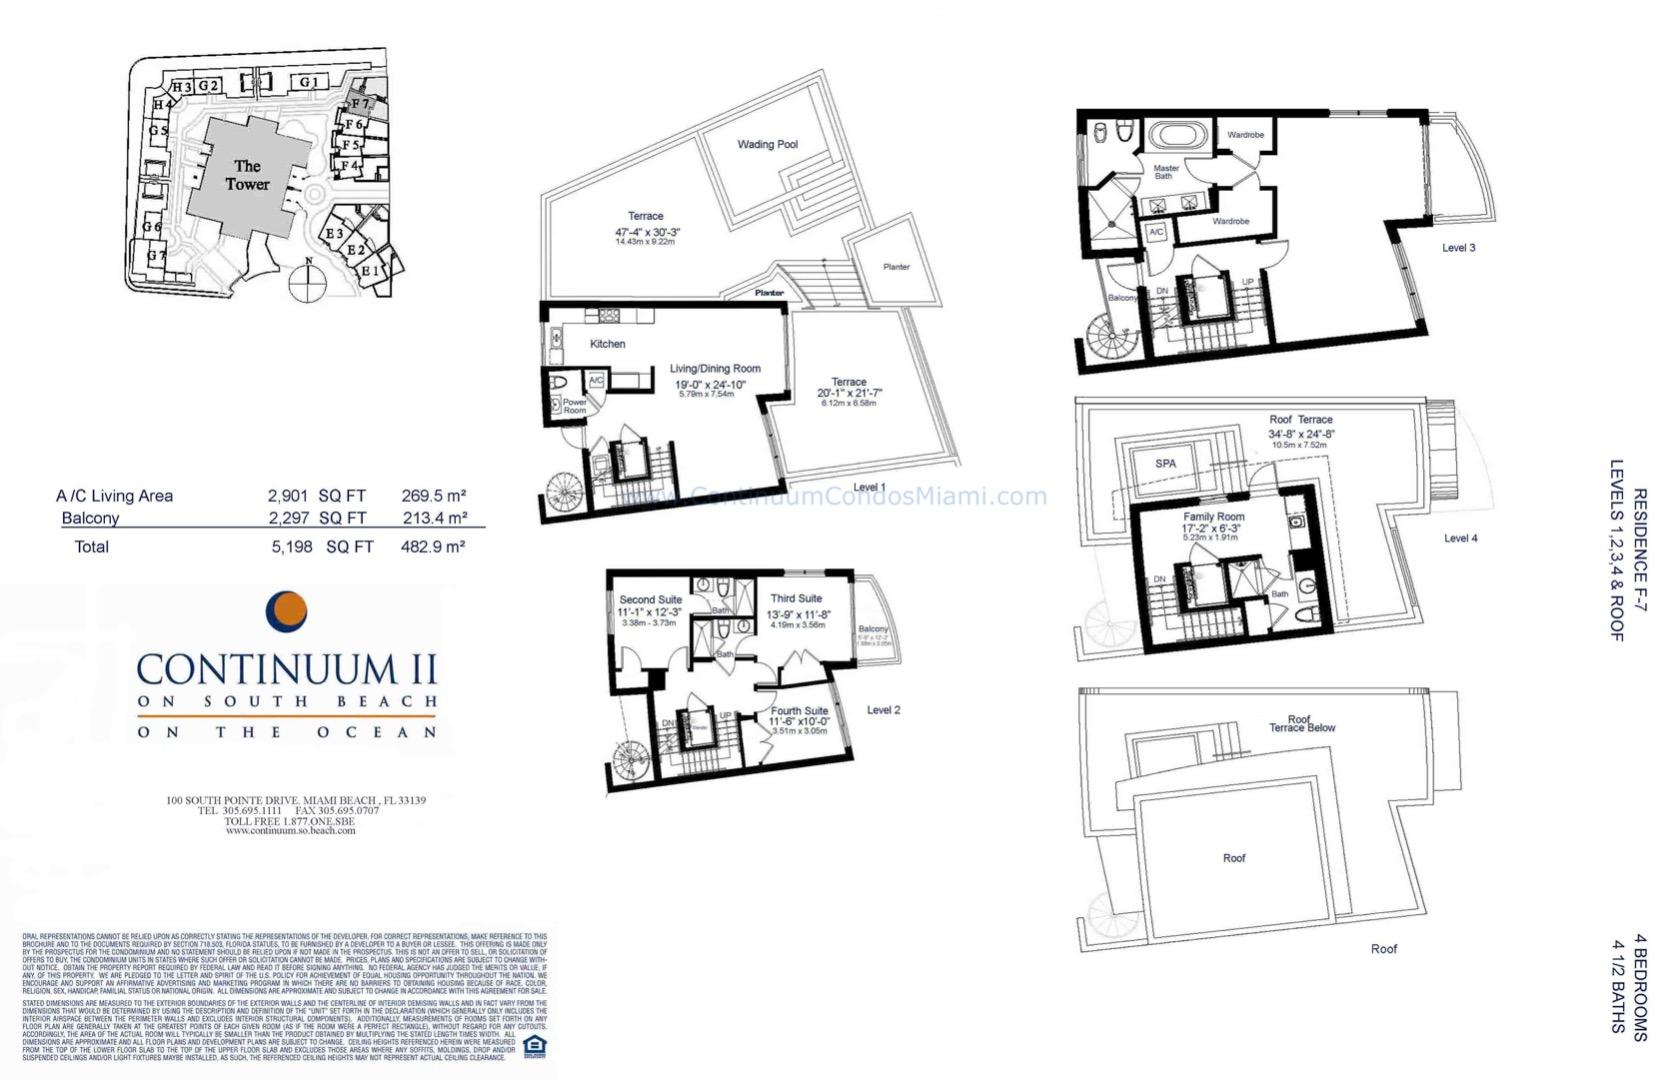 Floor plan image TH7 - 4/4/1  - 5198 sqft image